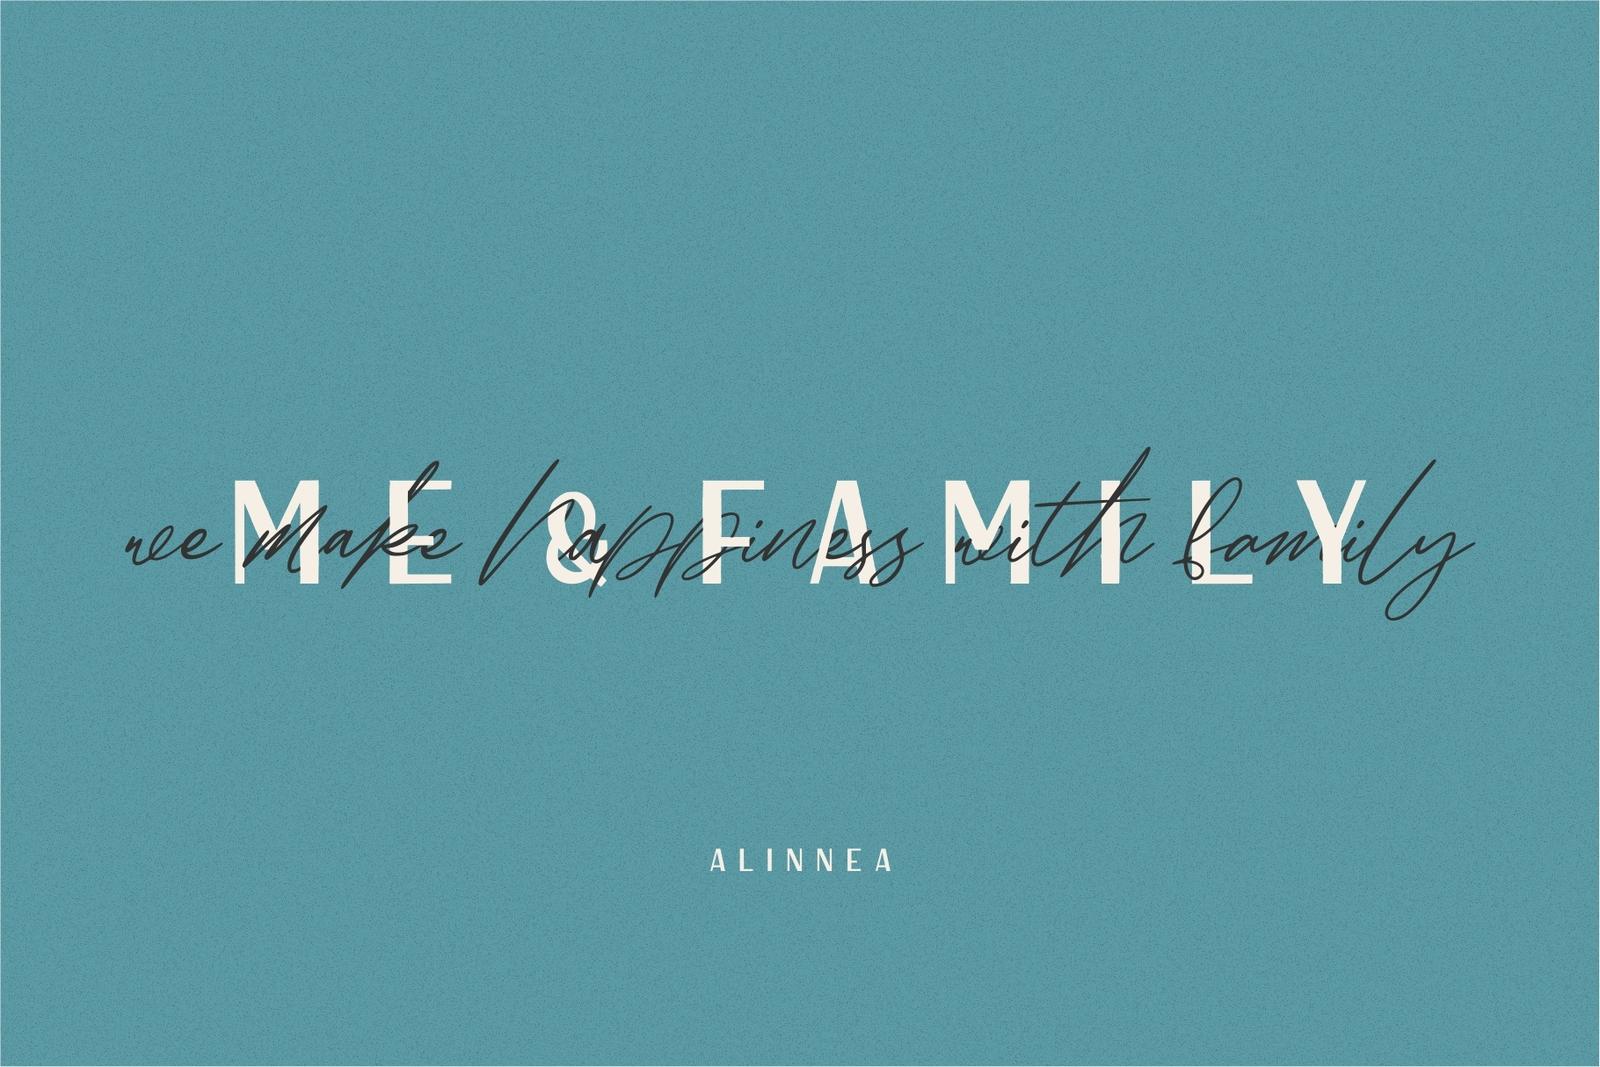 Alinnea - Handwritten fonts